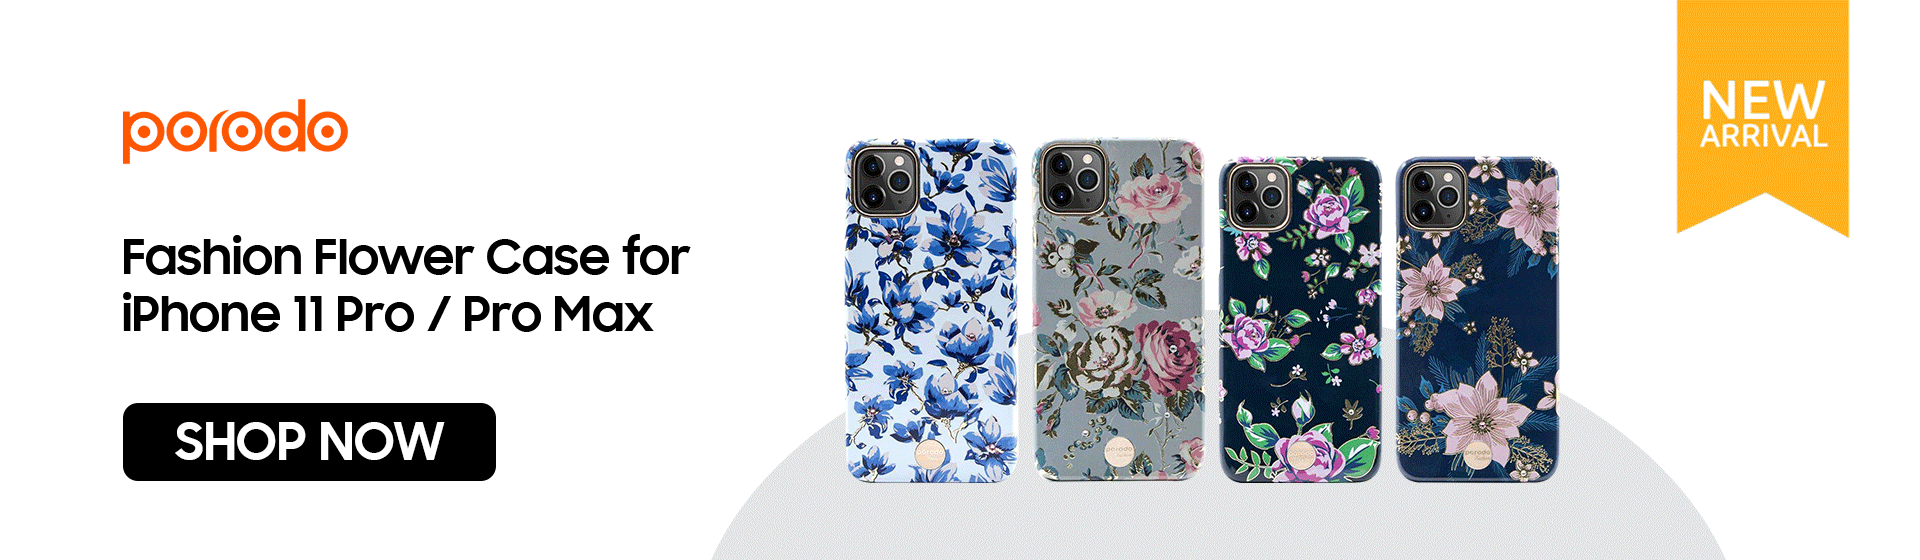 Porodo Fashion Flower Case for iPhone 11 / 11 Pro / Pro Max